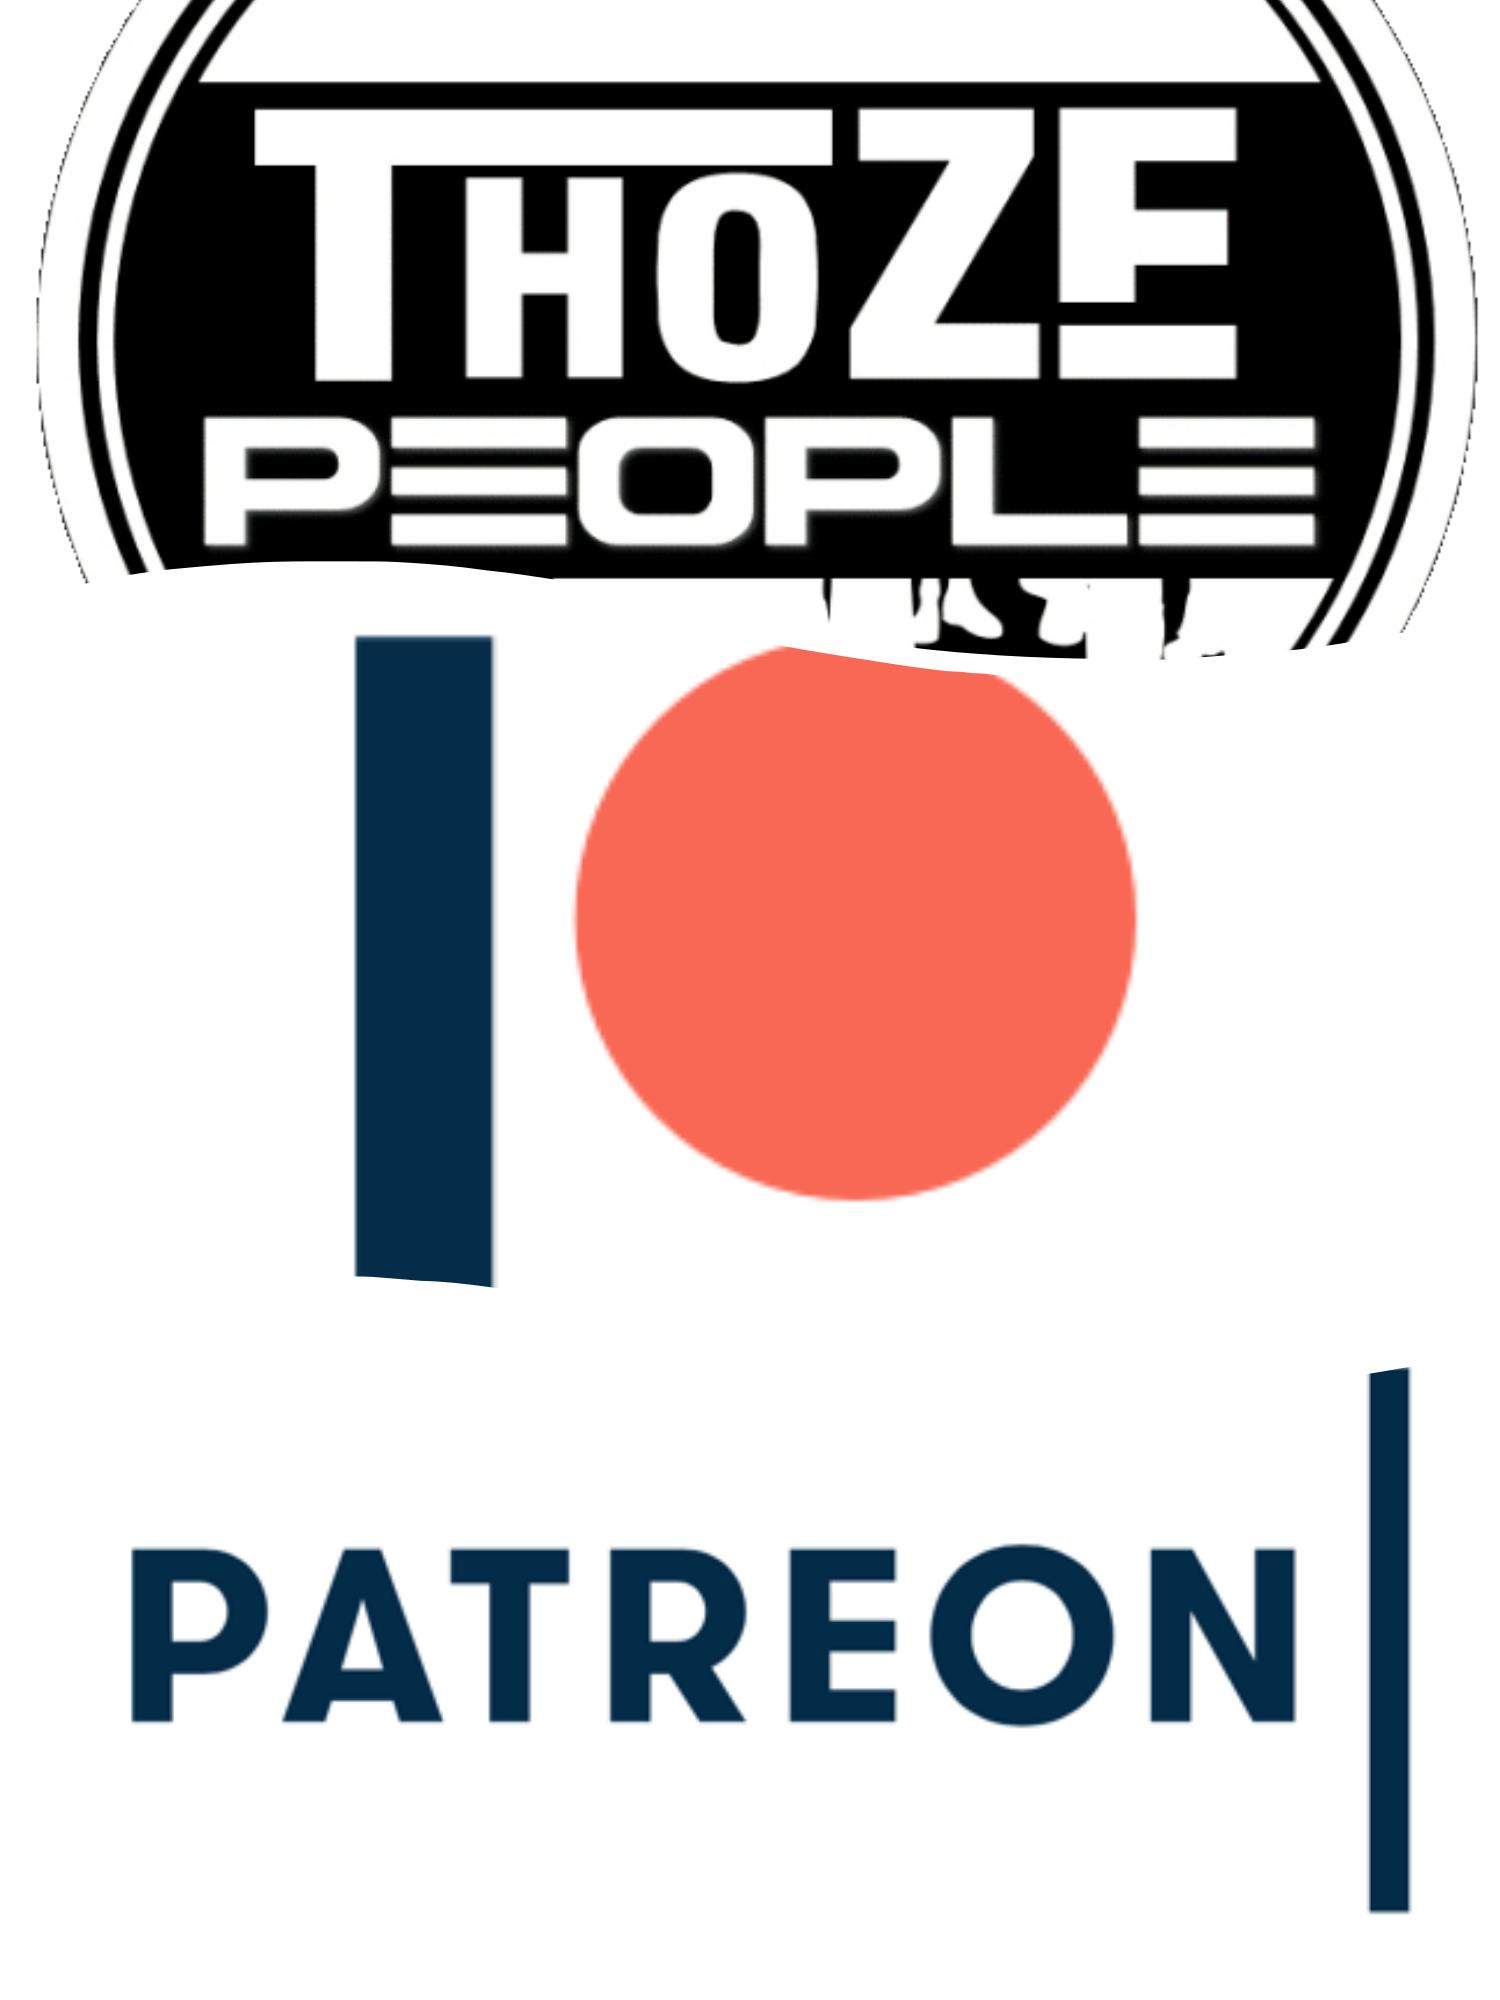 Patreon Thoze People.jpg